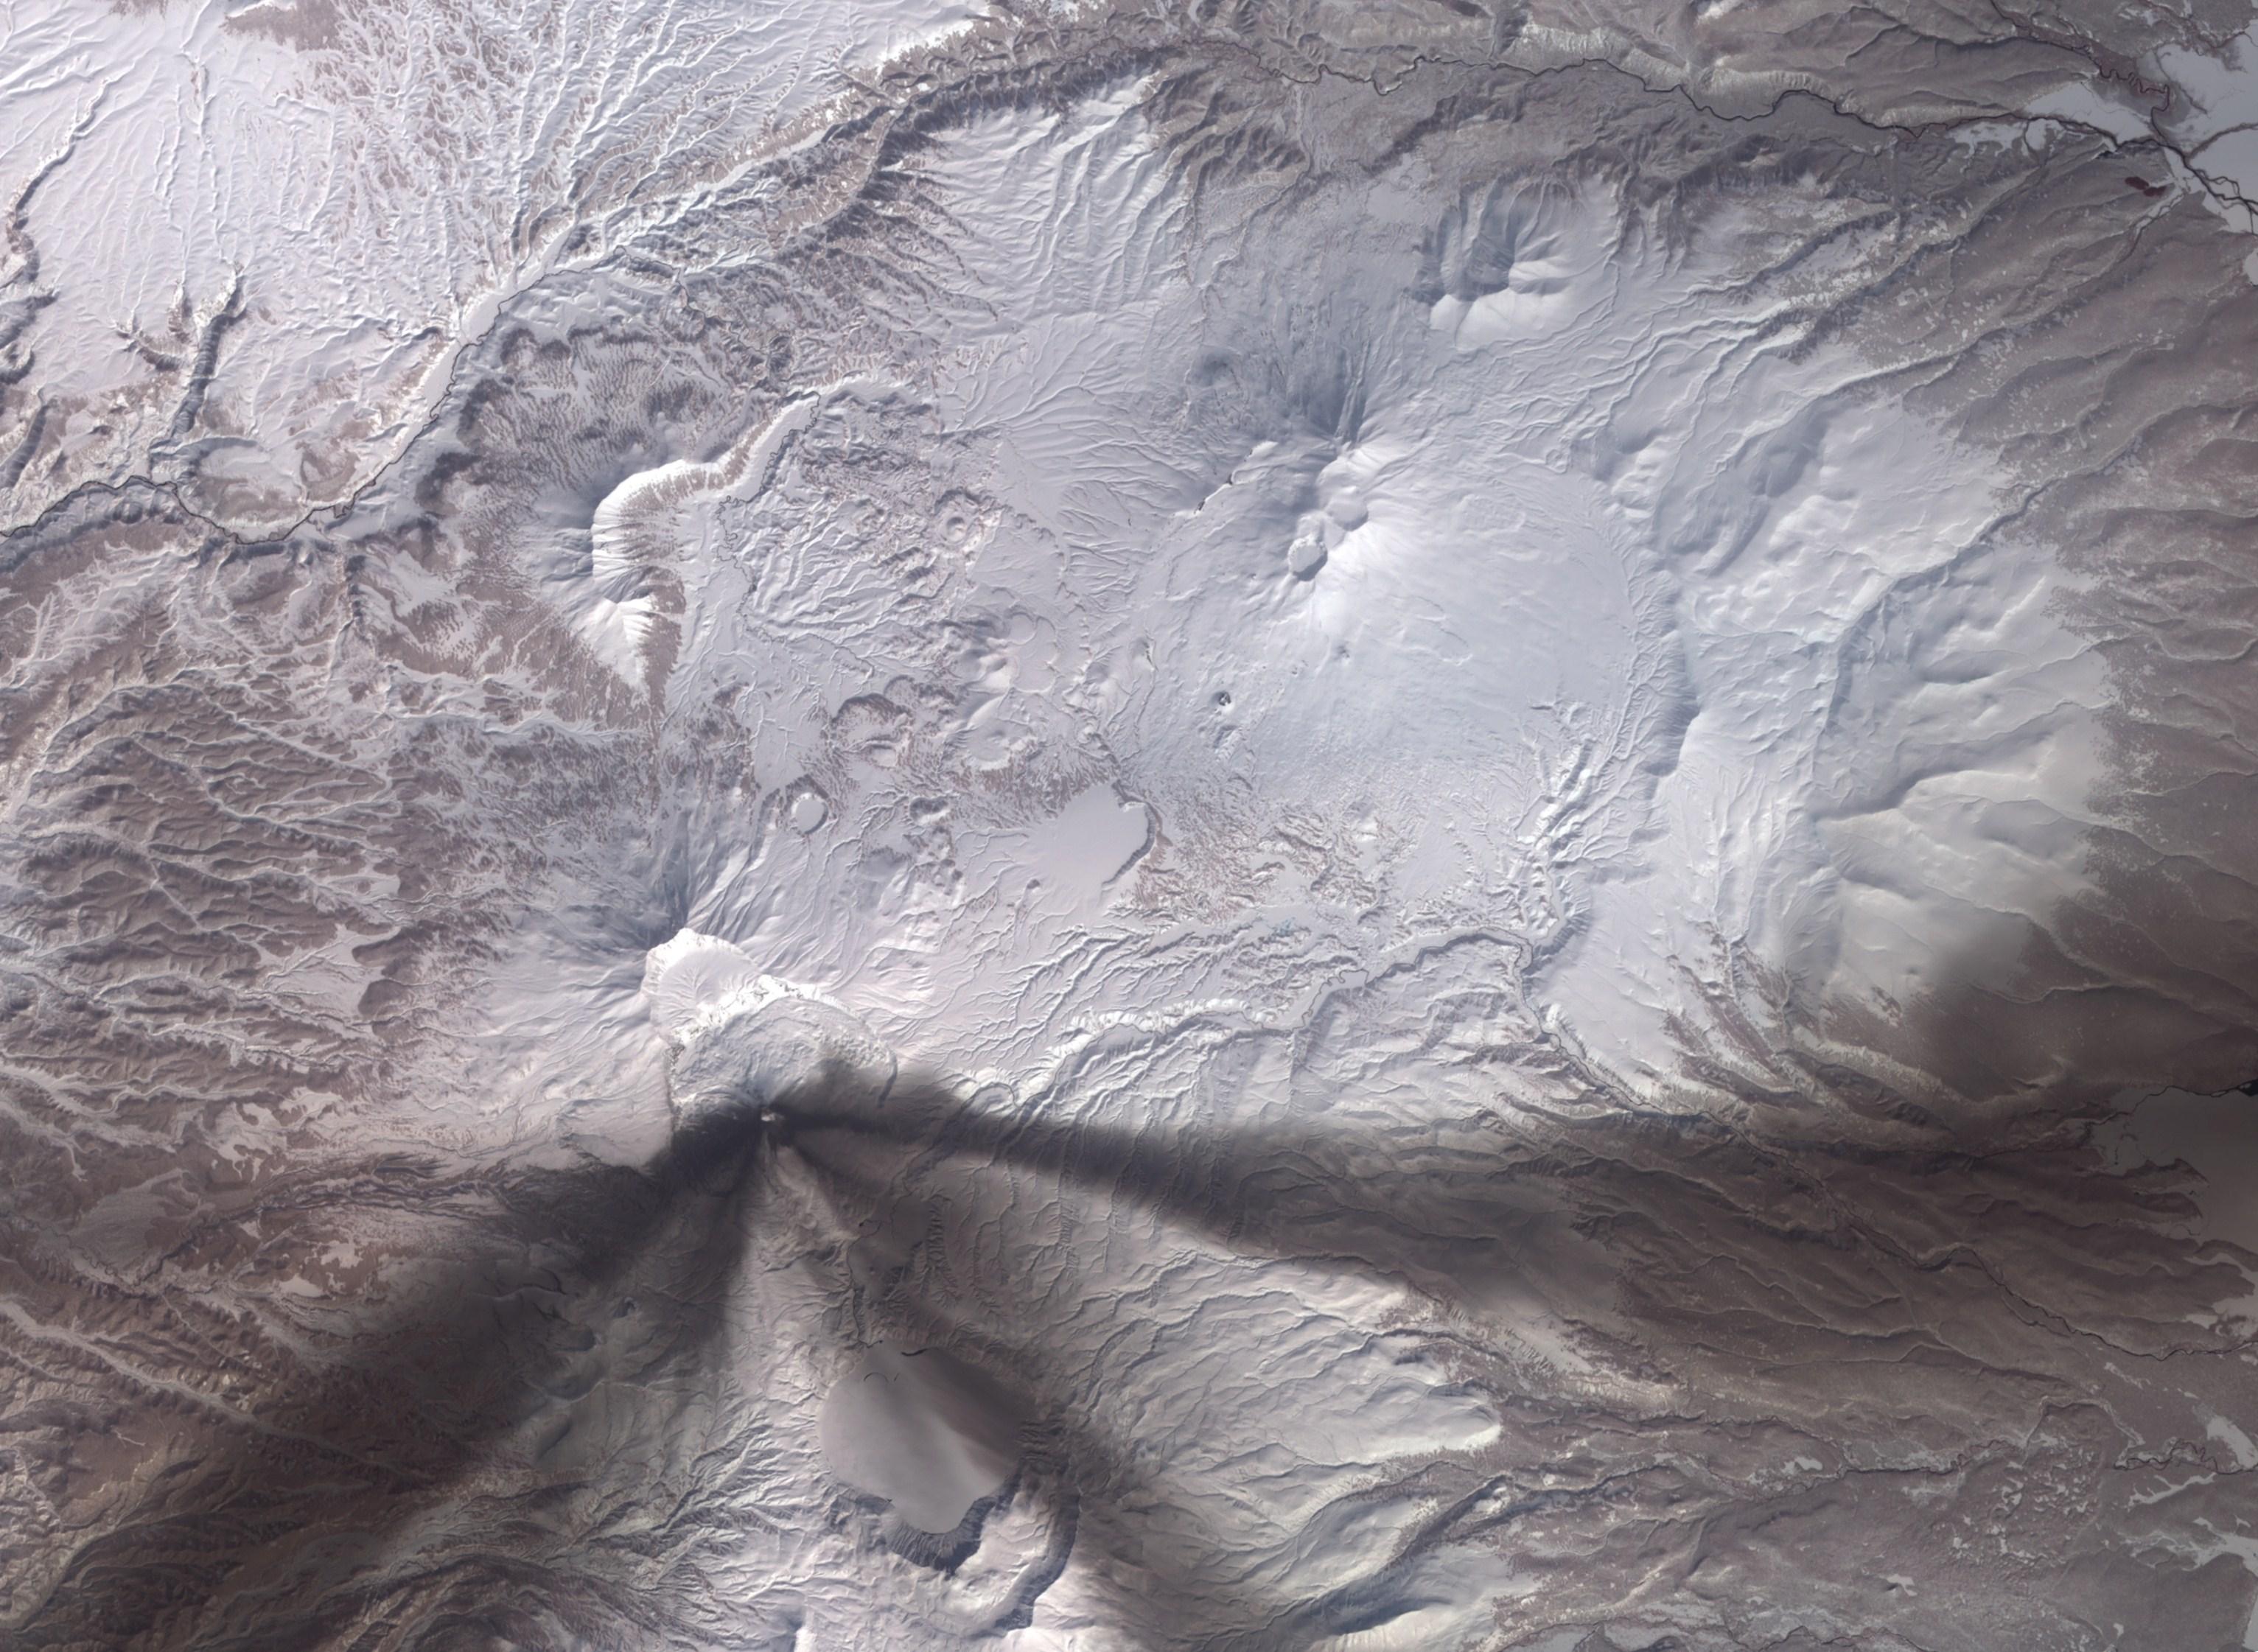 File:Volcanic Ash on Slopes of Karymsky.jpg - Wikimedia ...